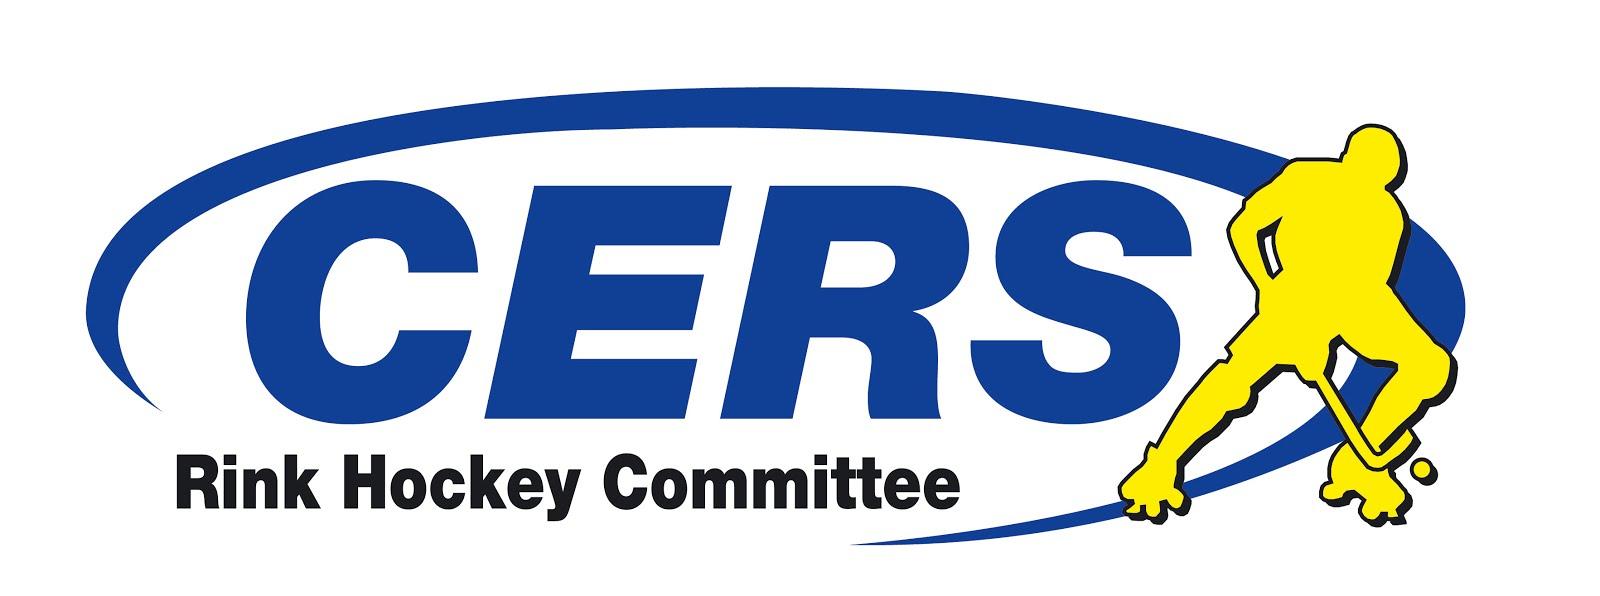 CERS - Comité Européen de Rink-Hockey